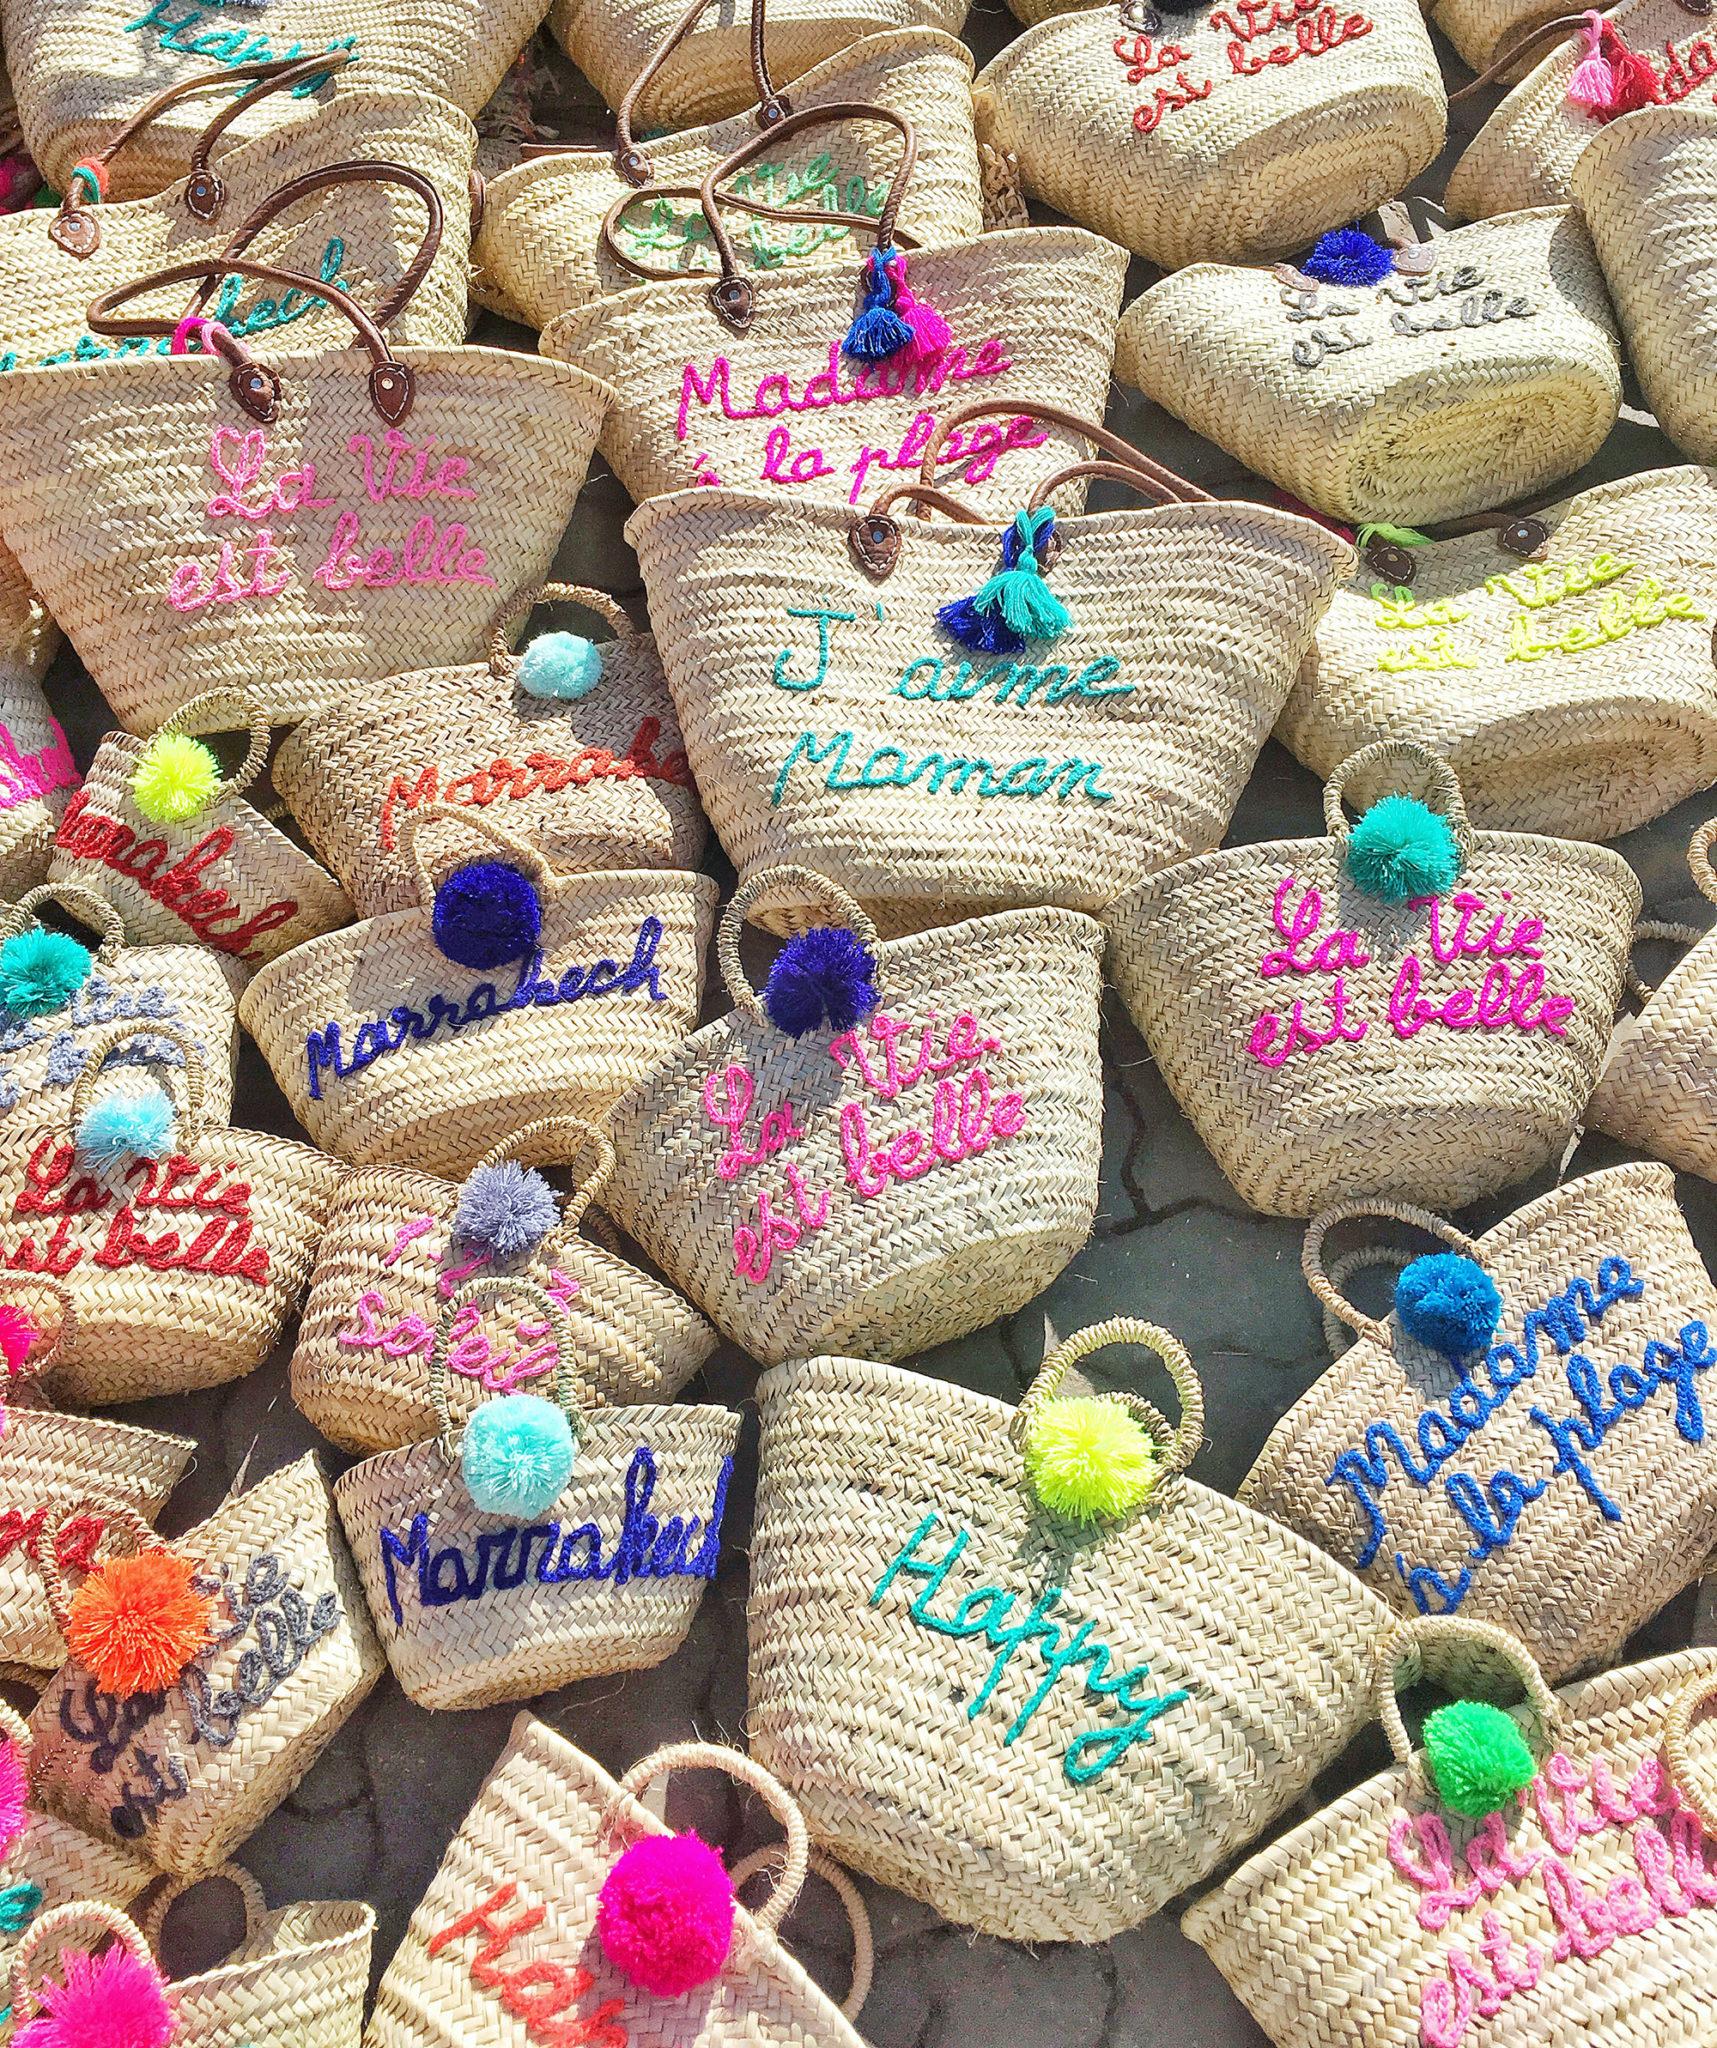 The Souks of Marrakech, Custom Woven Bags